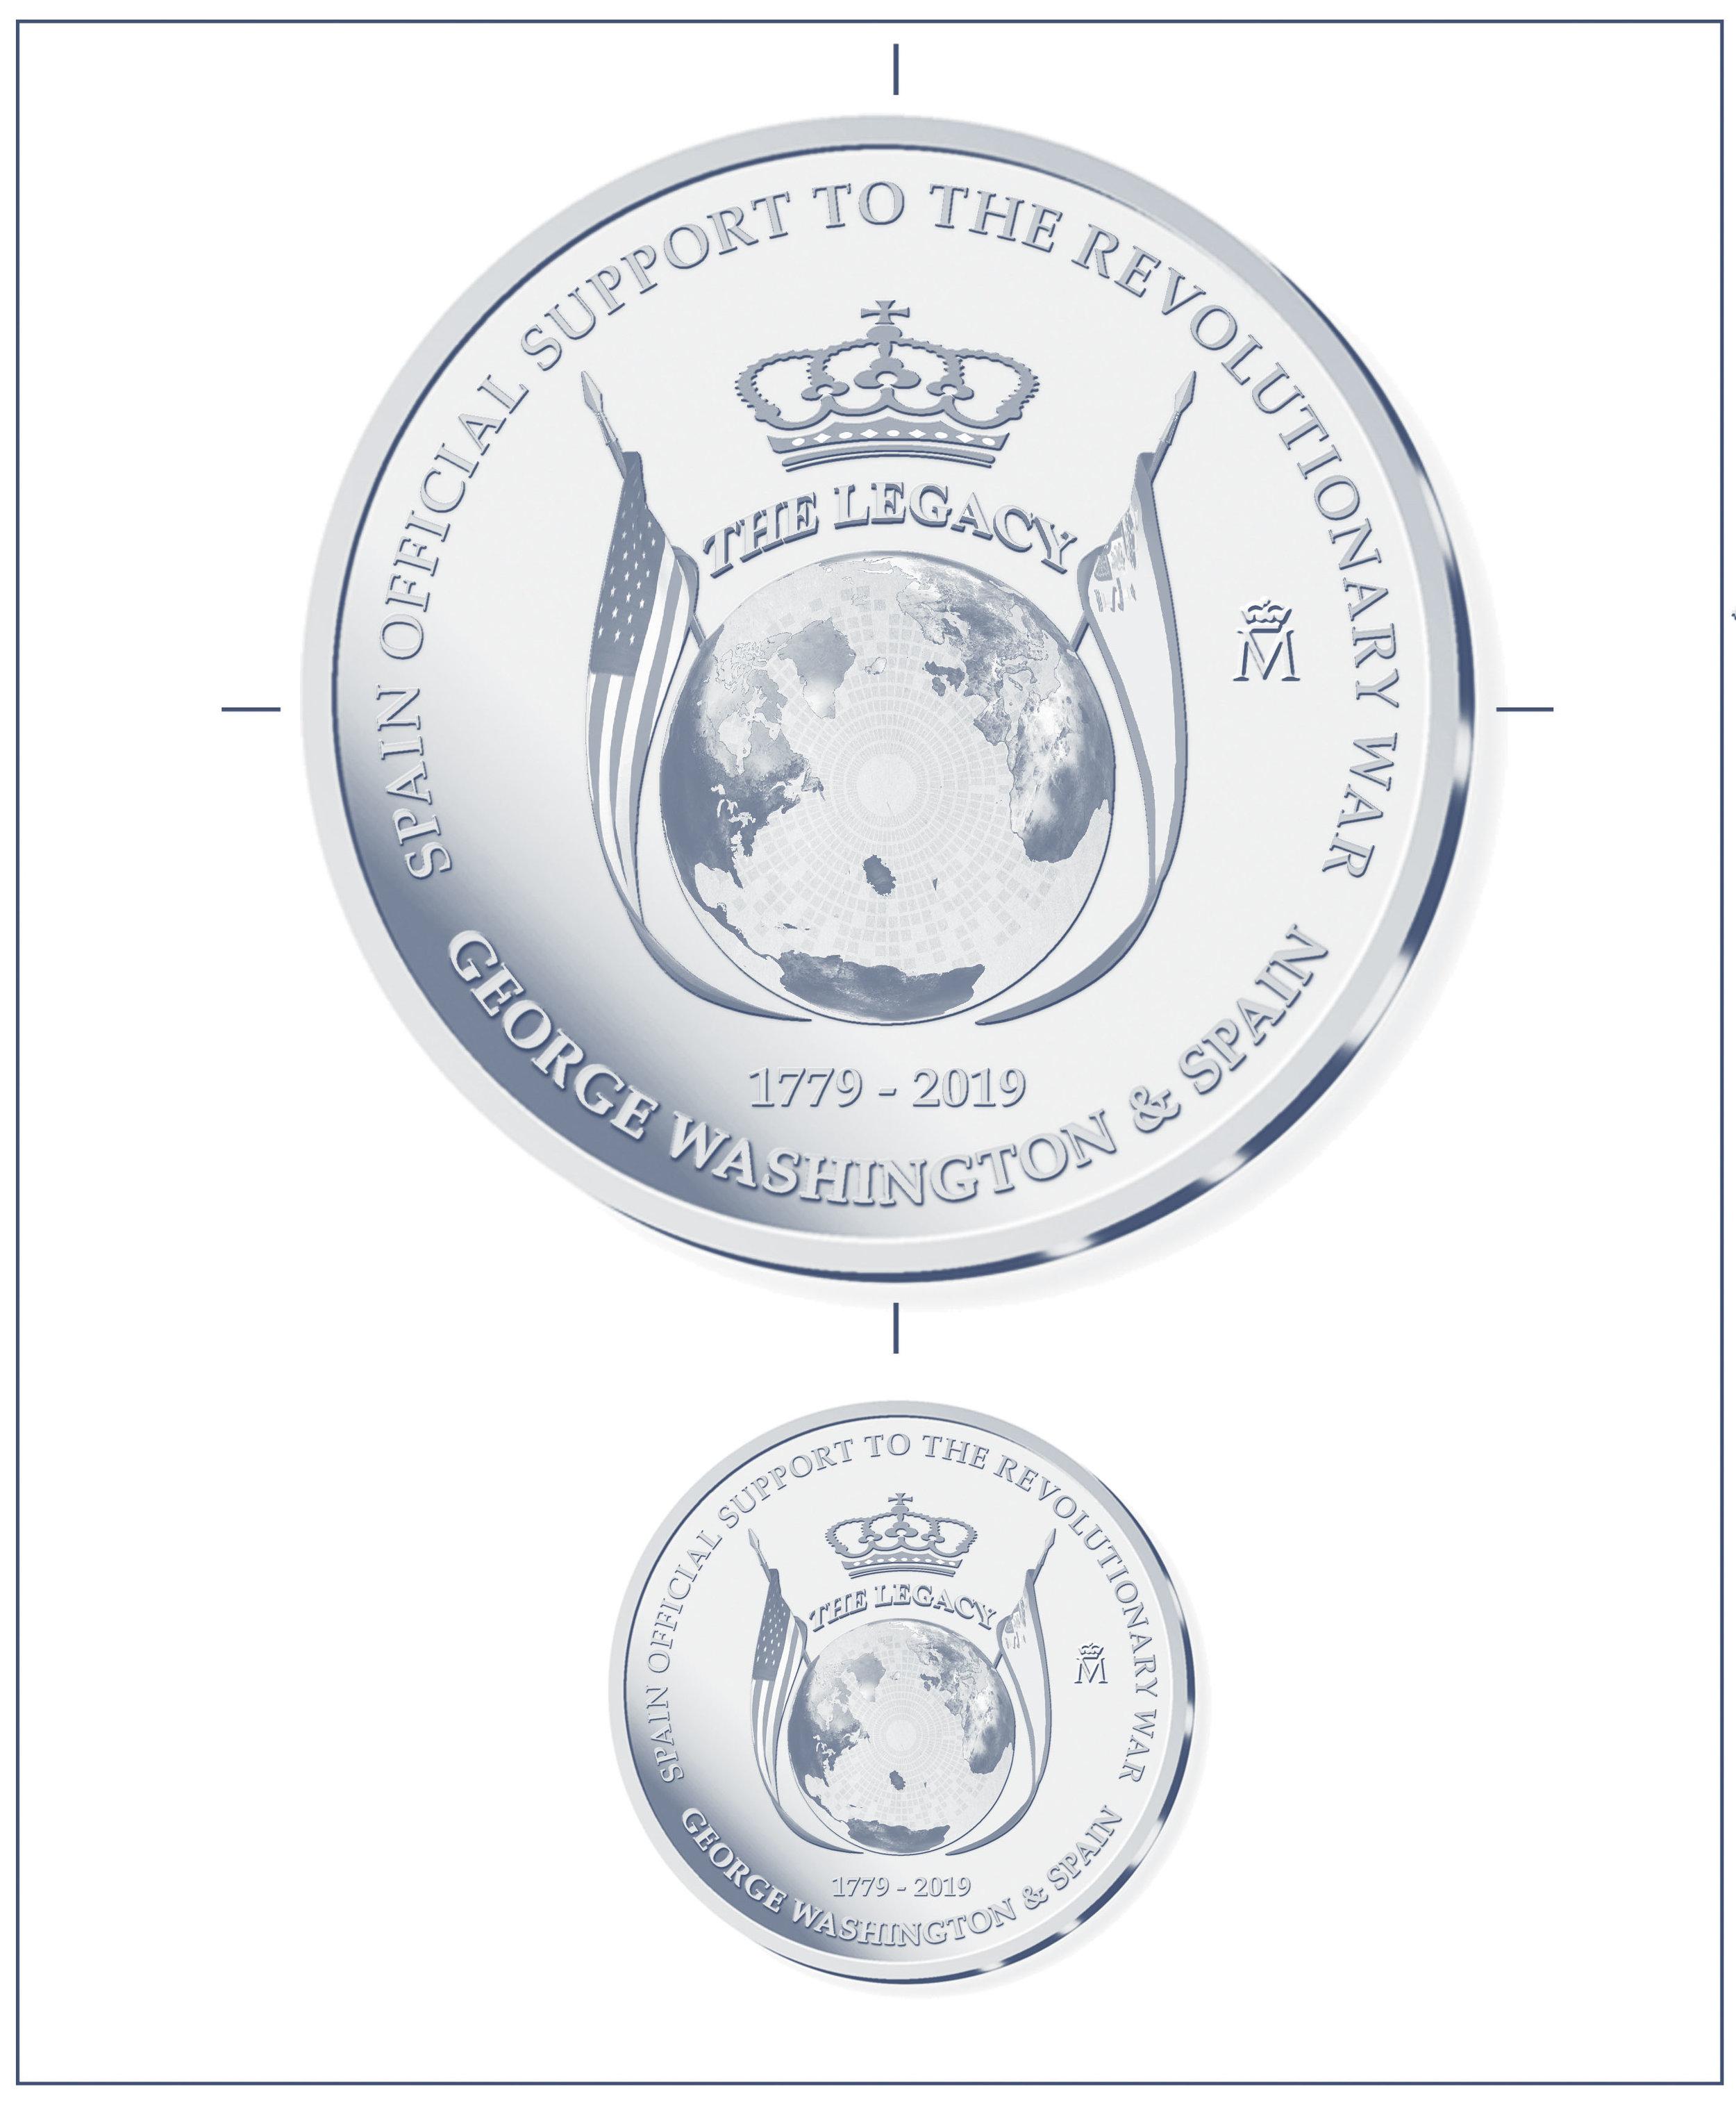 Monedas_1.jpg